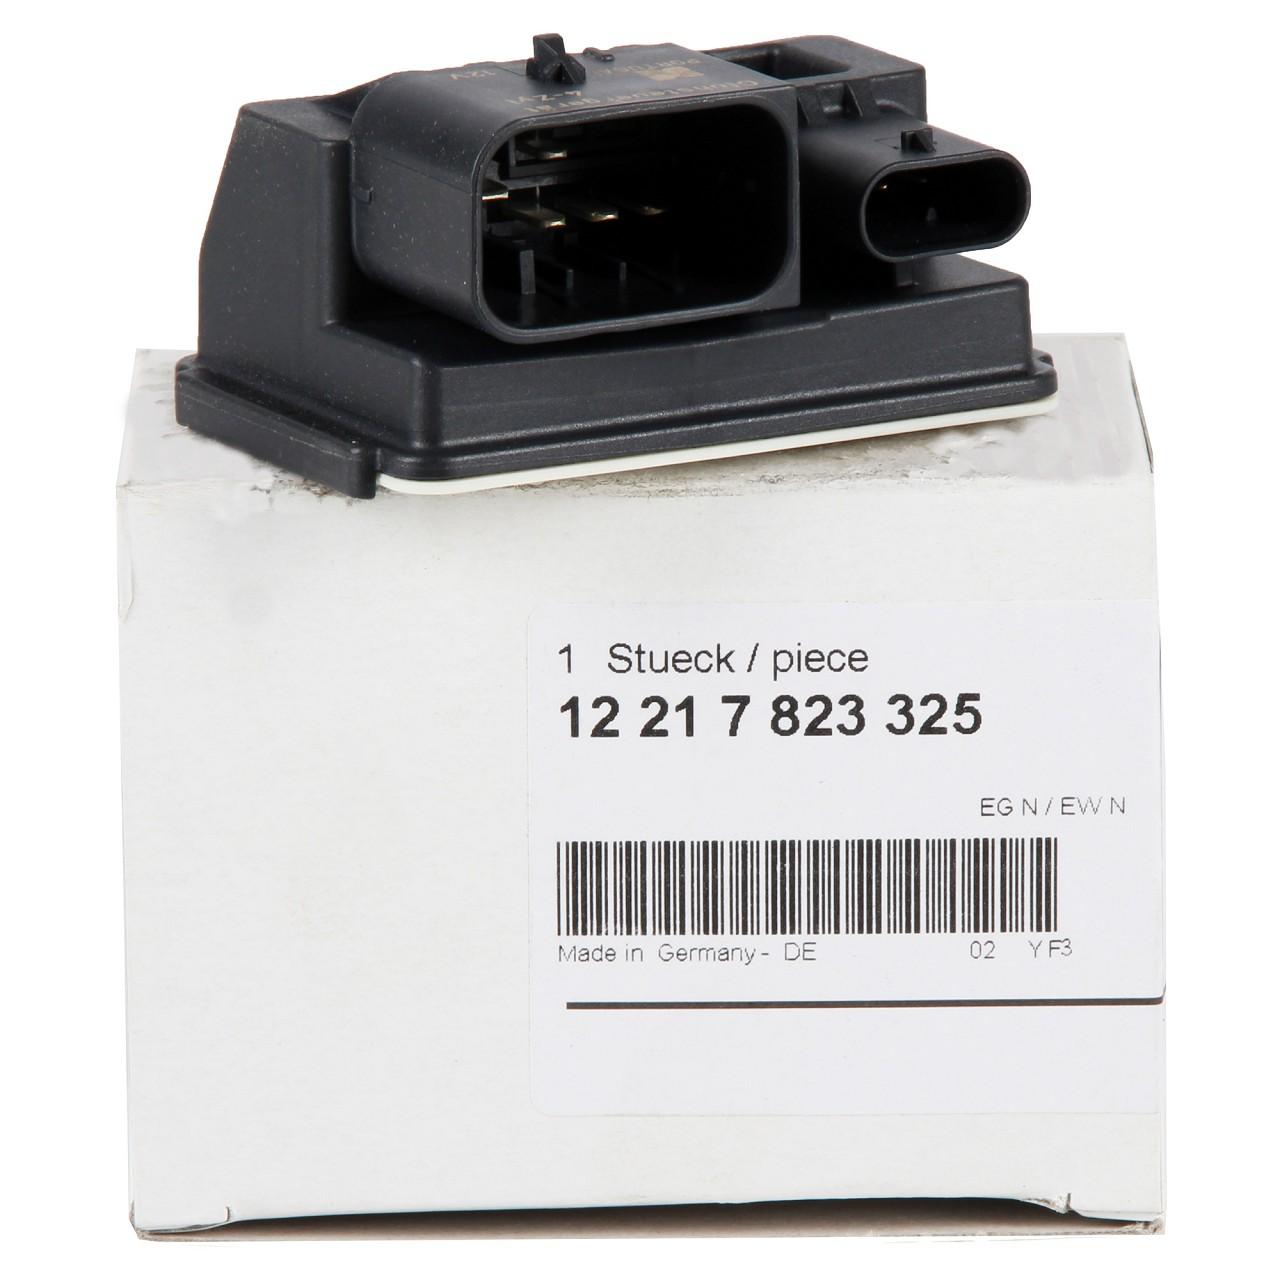 ORIGINAL MINI Steuergerät Glühzeit Glühkerzen R56 CABRIO 1.6 & 2.0 D 12217823325